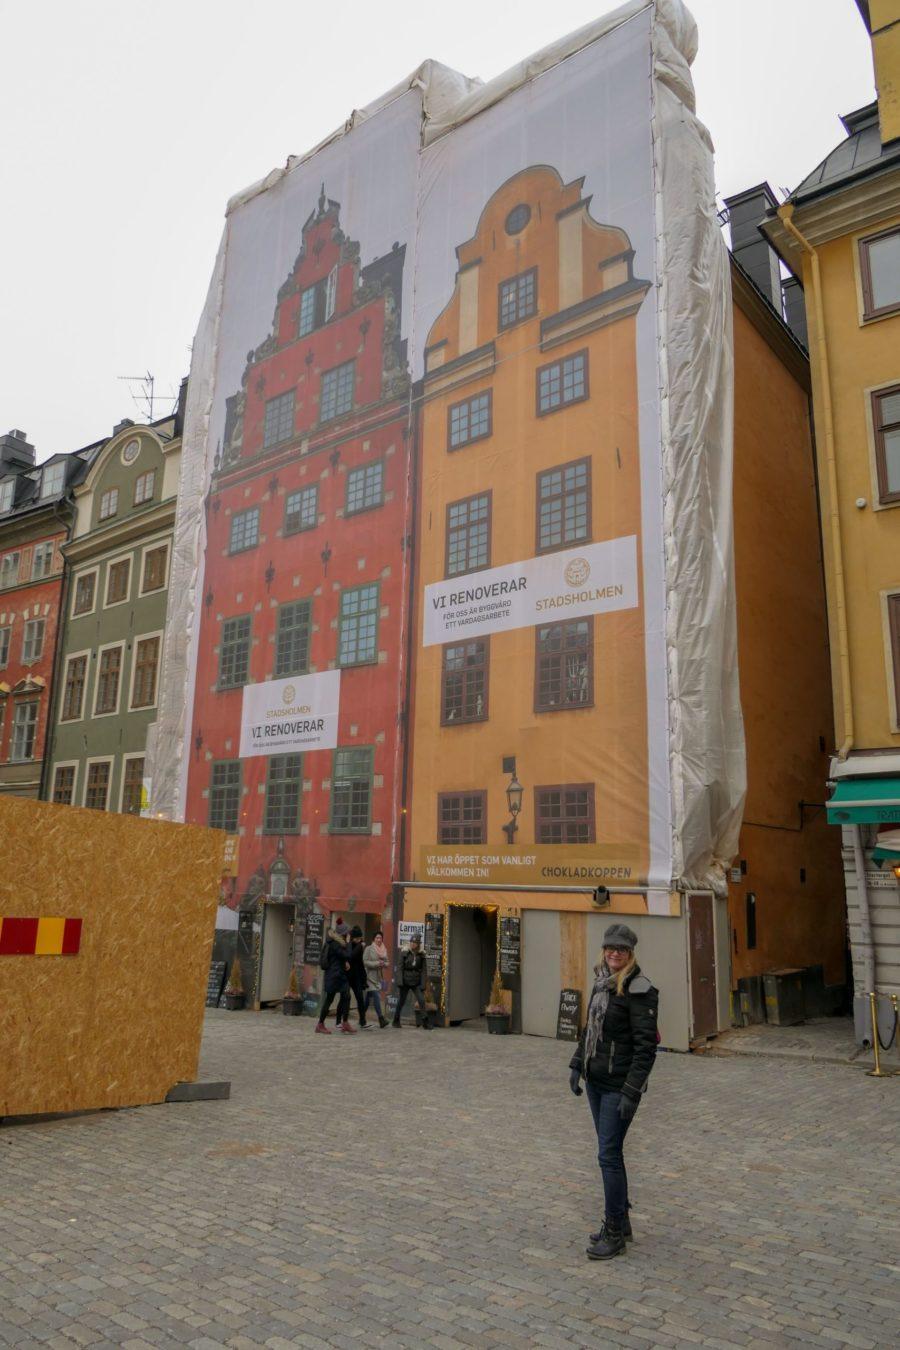 Stockholm Schweden Gamla Stan Stadsholmen Altstadt Stortorget